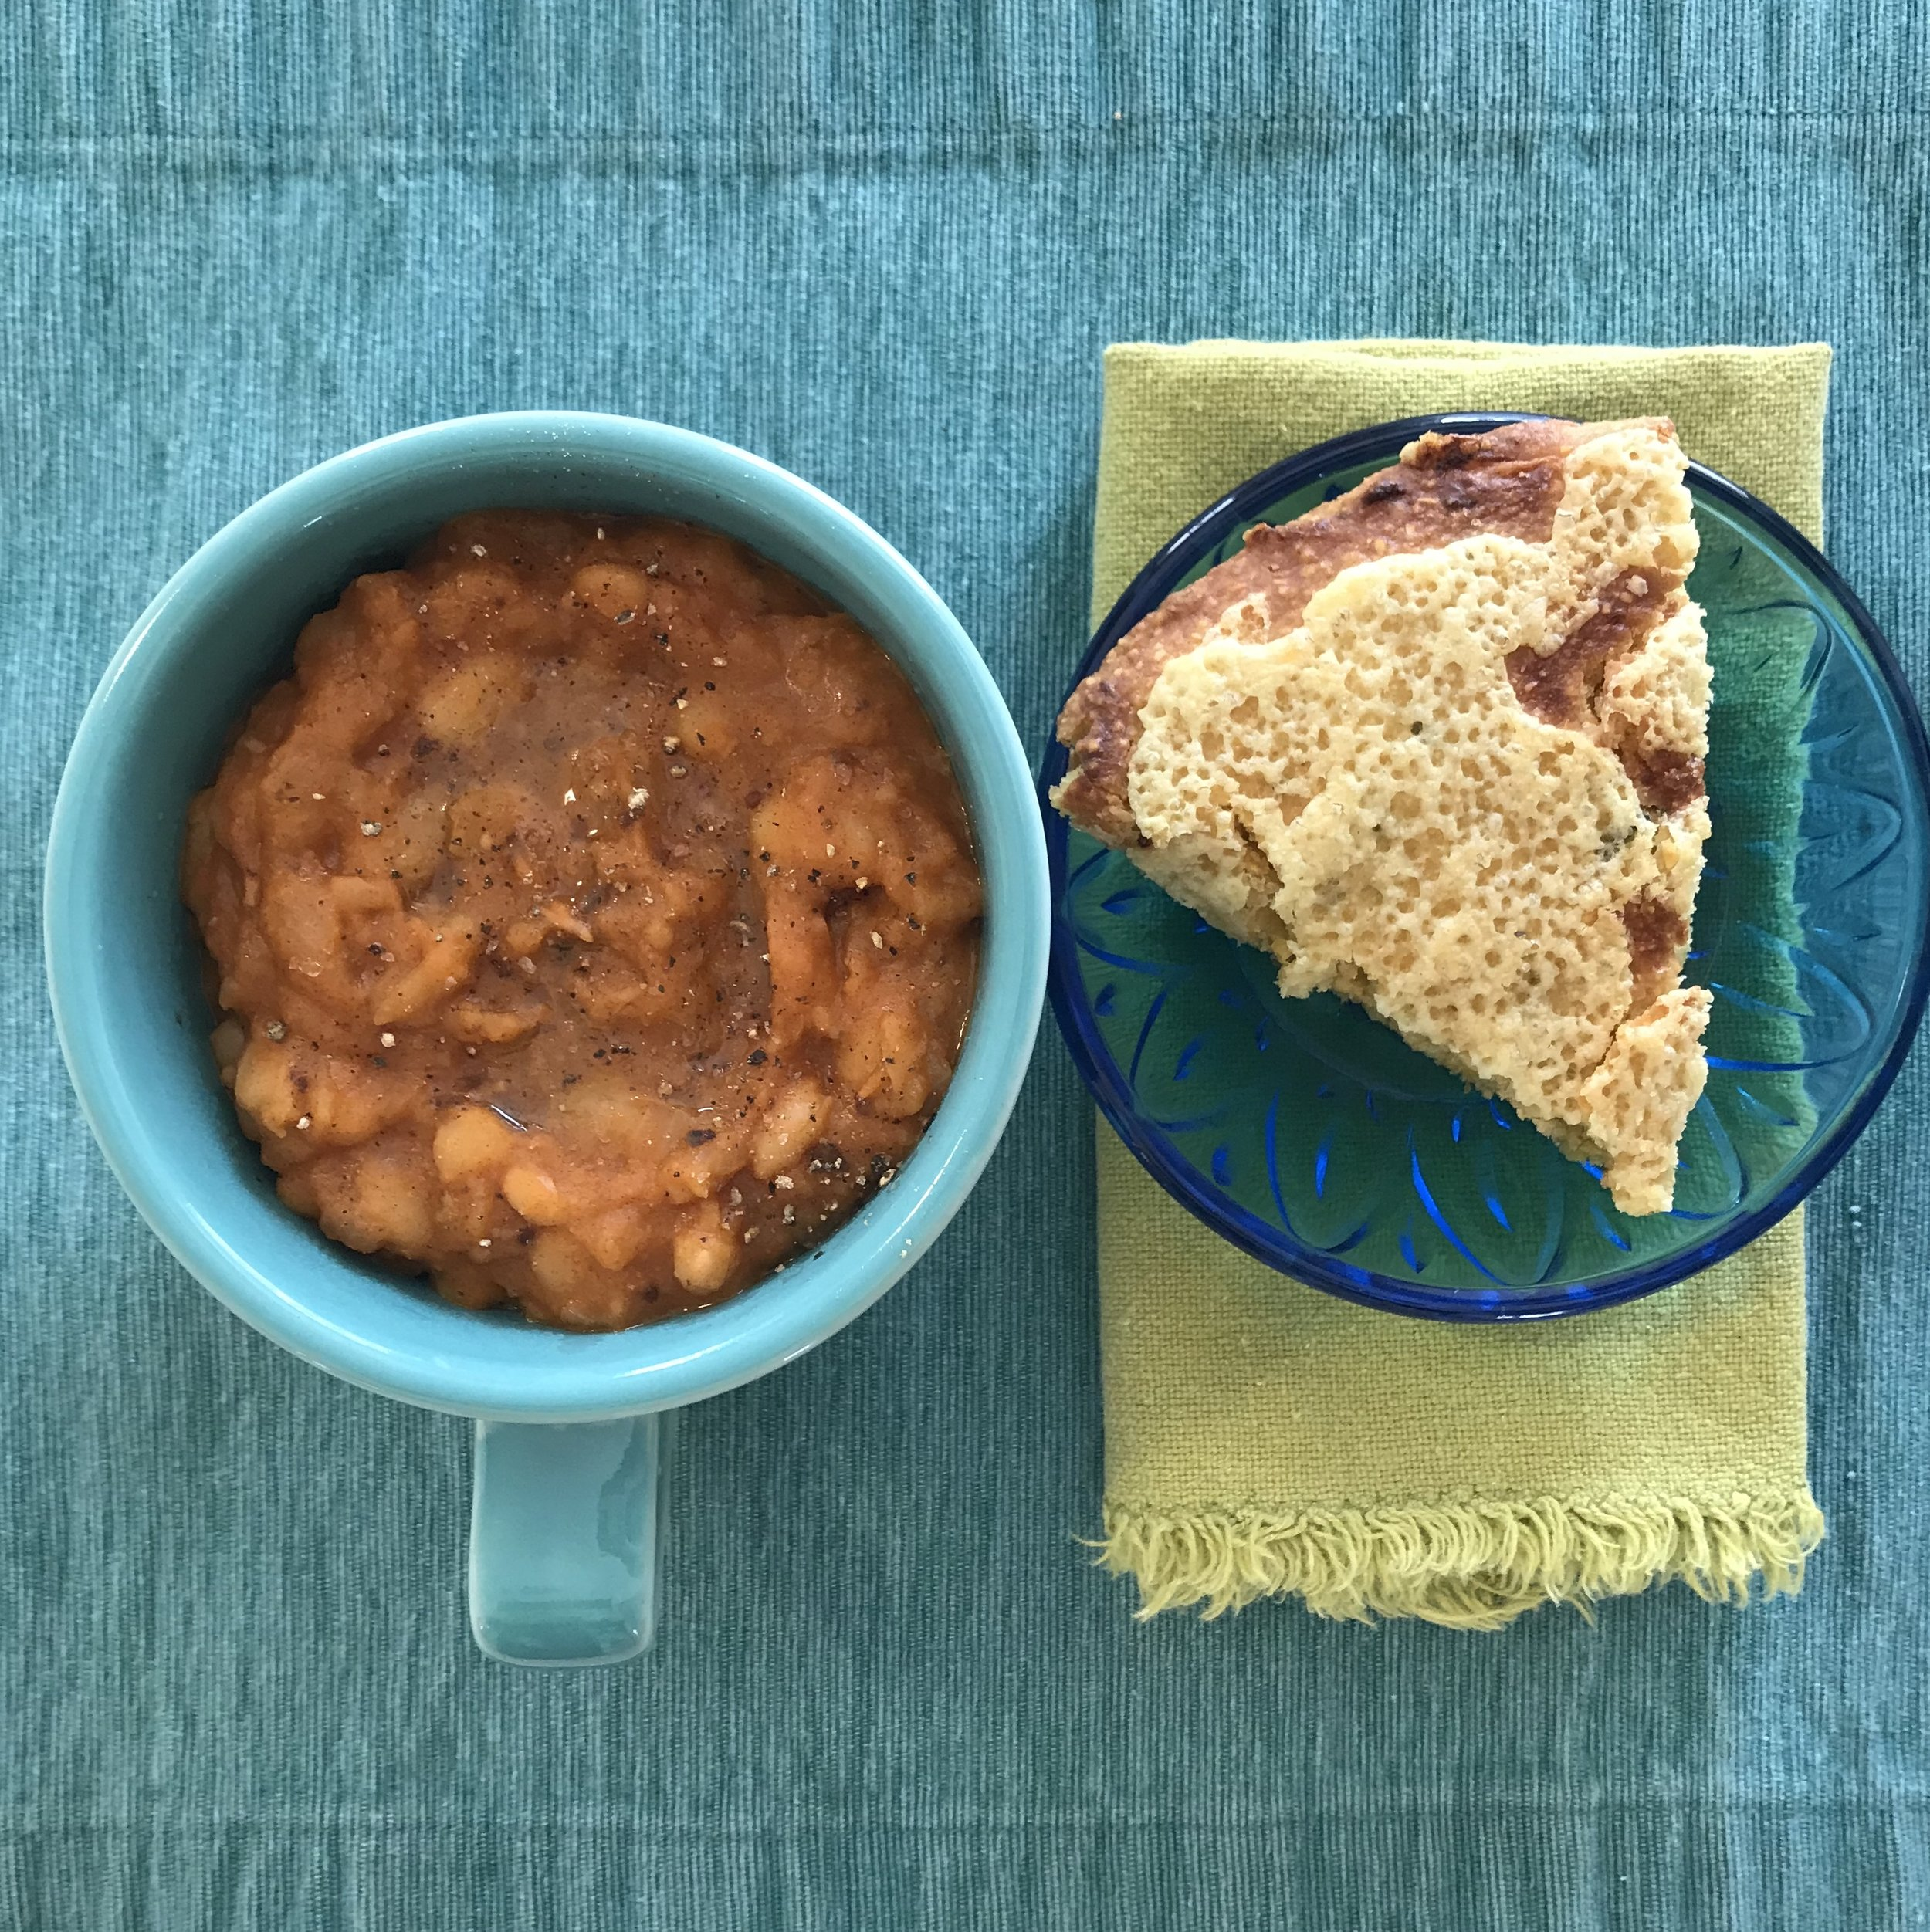 baked beans + cornbread